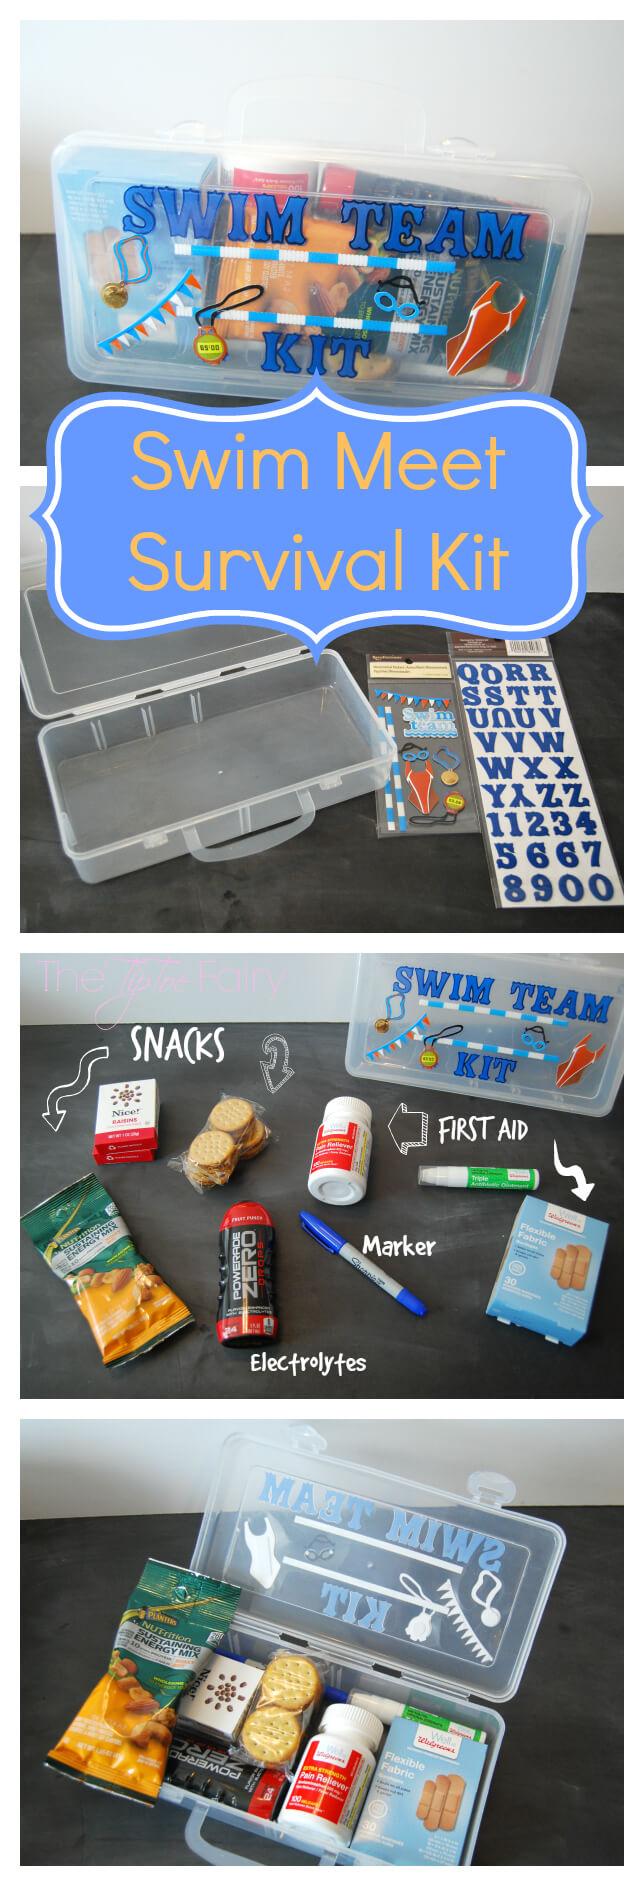 Got a Kid in Sports? Make a Sports Kit! Check this Swim Team Kit! | The TipToe Fairy #WellAtWalgreens #shop #swimteam #sportskit